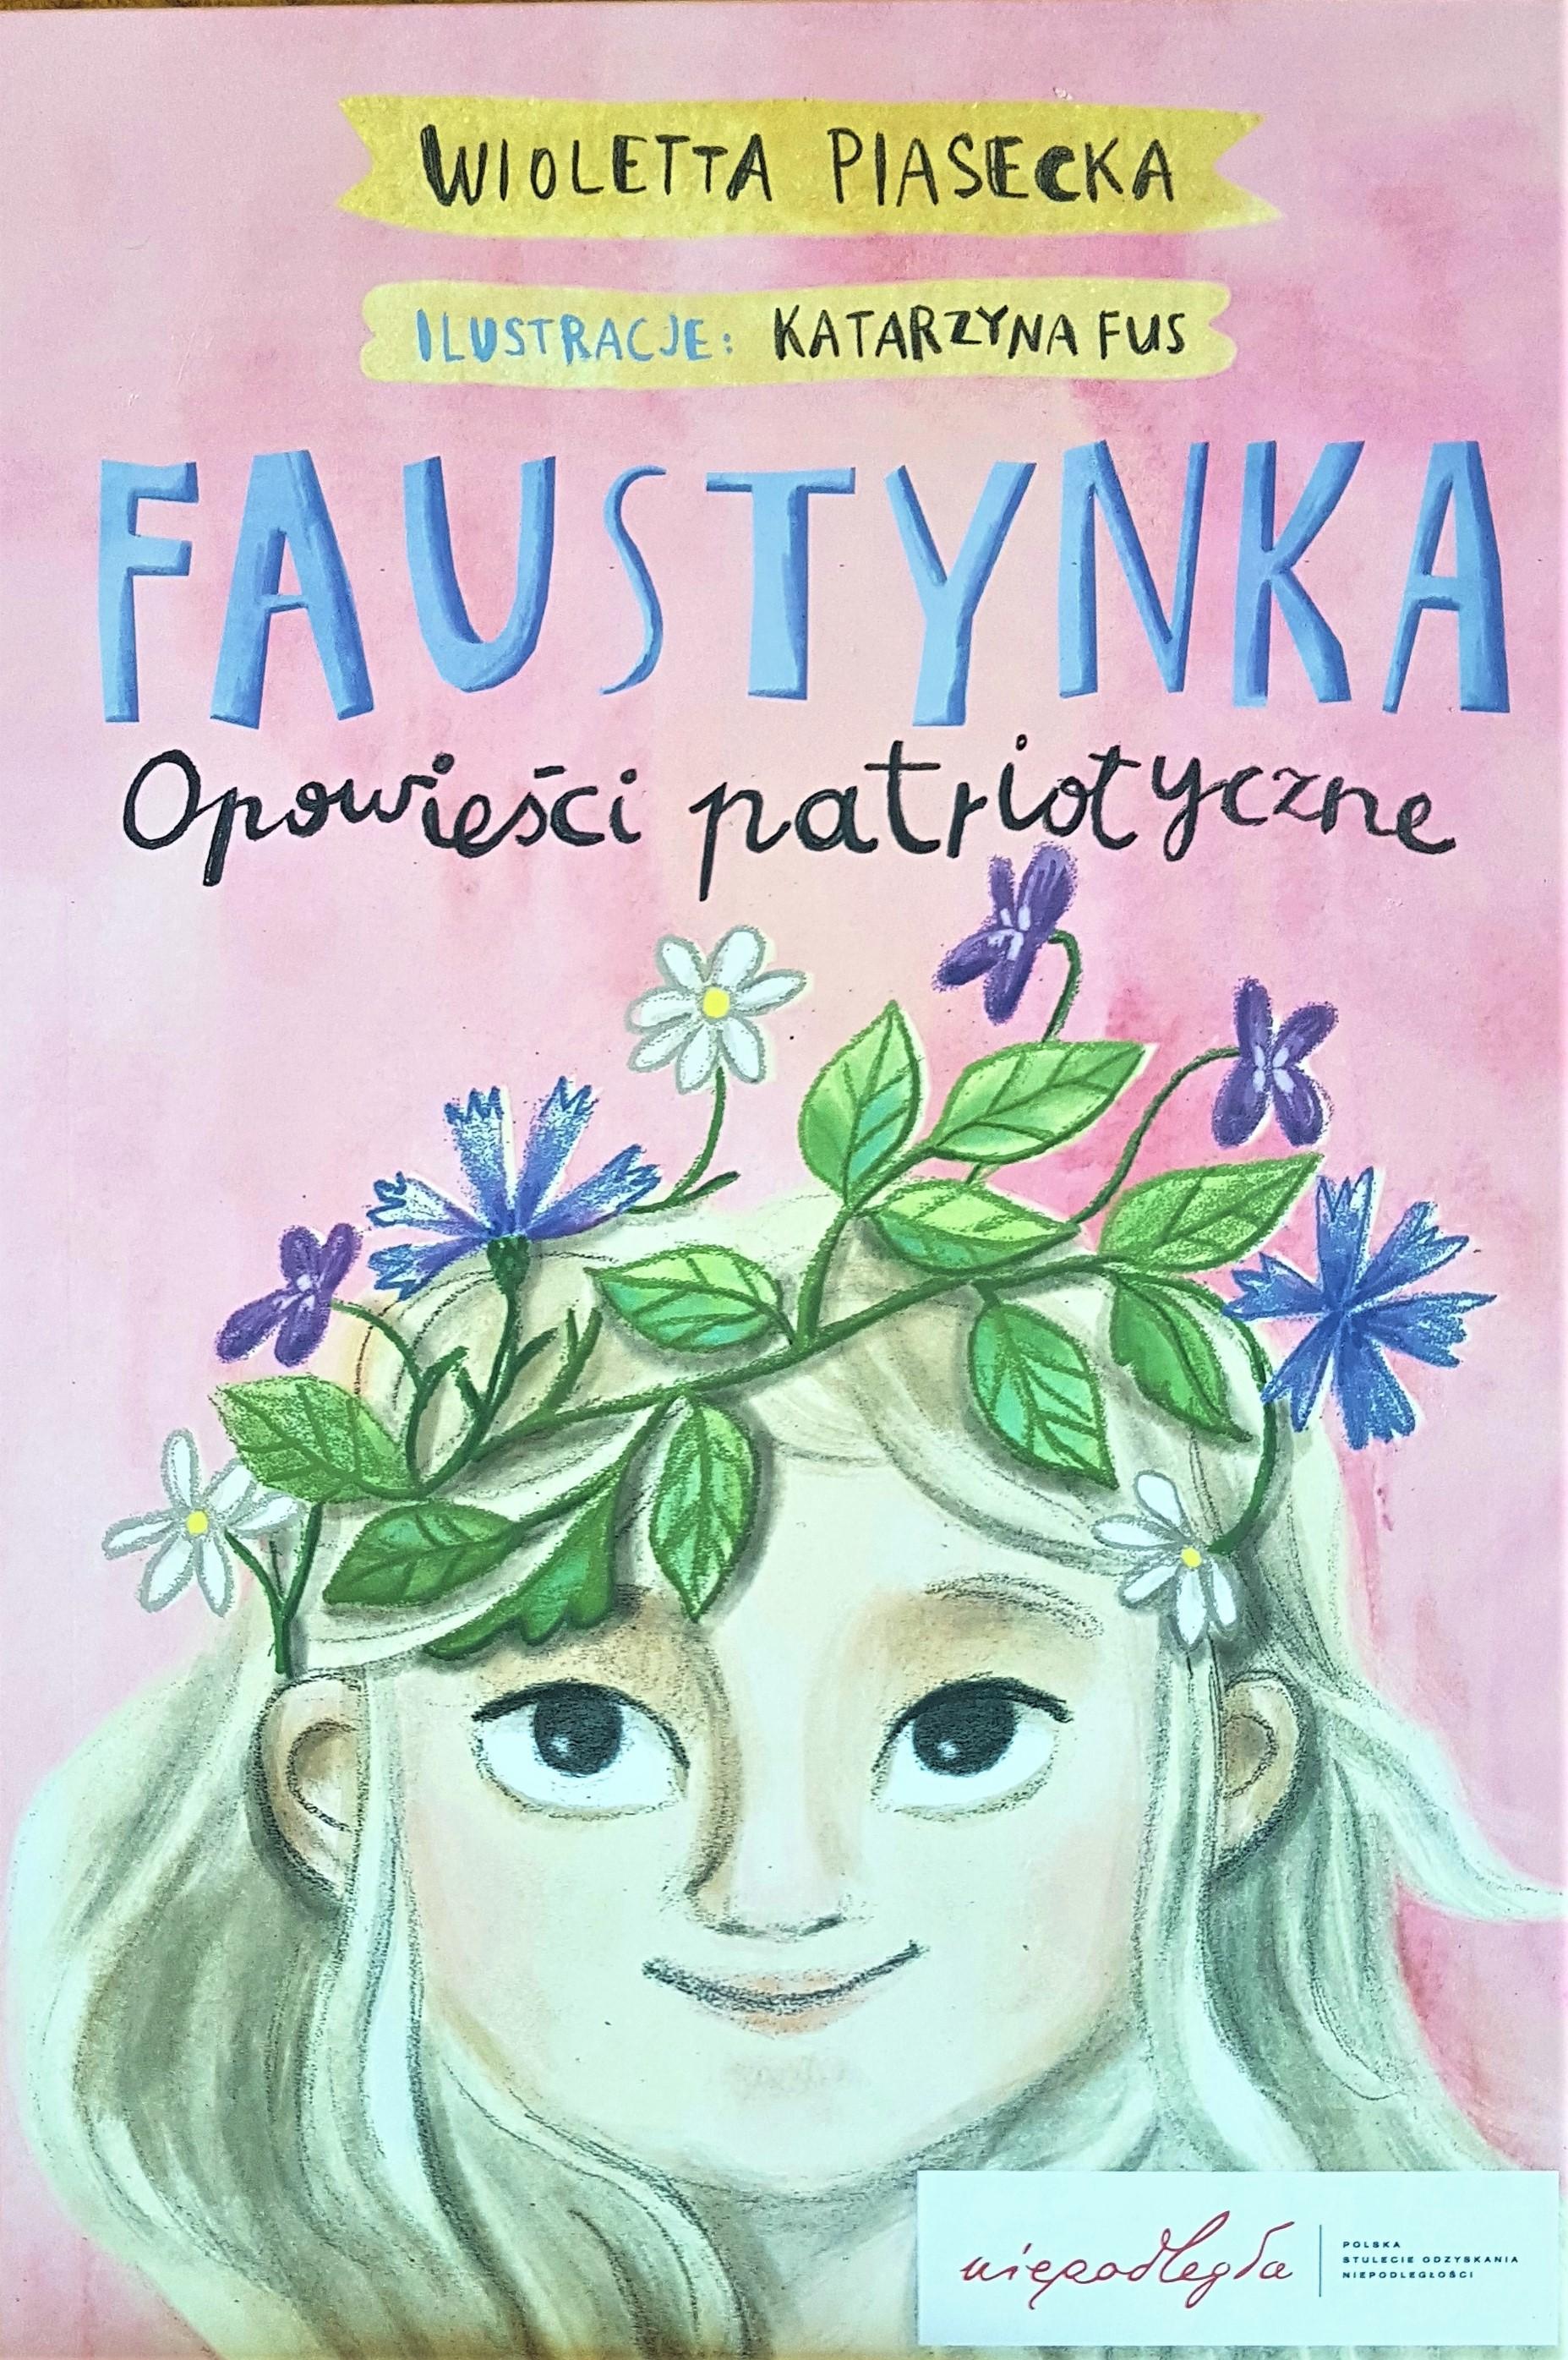 Faustynka - Wioletta Piasecka